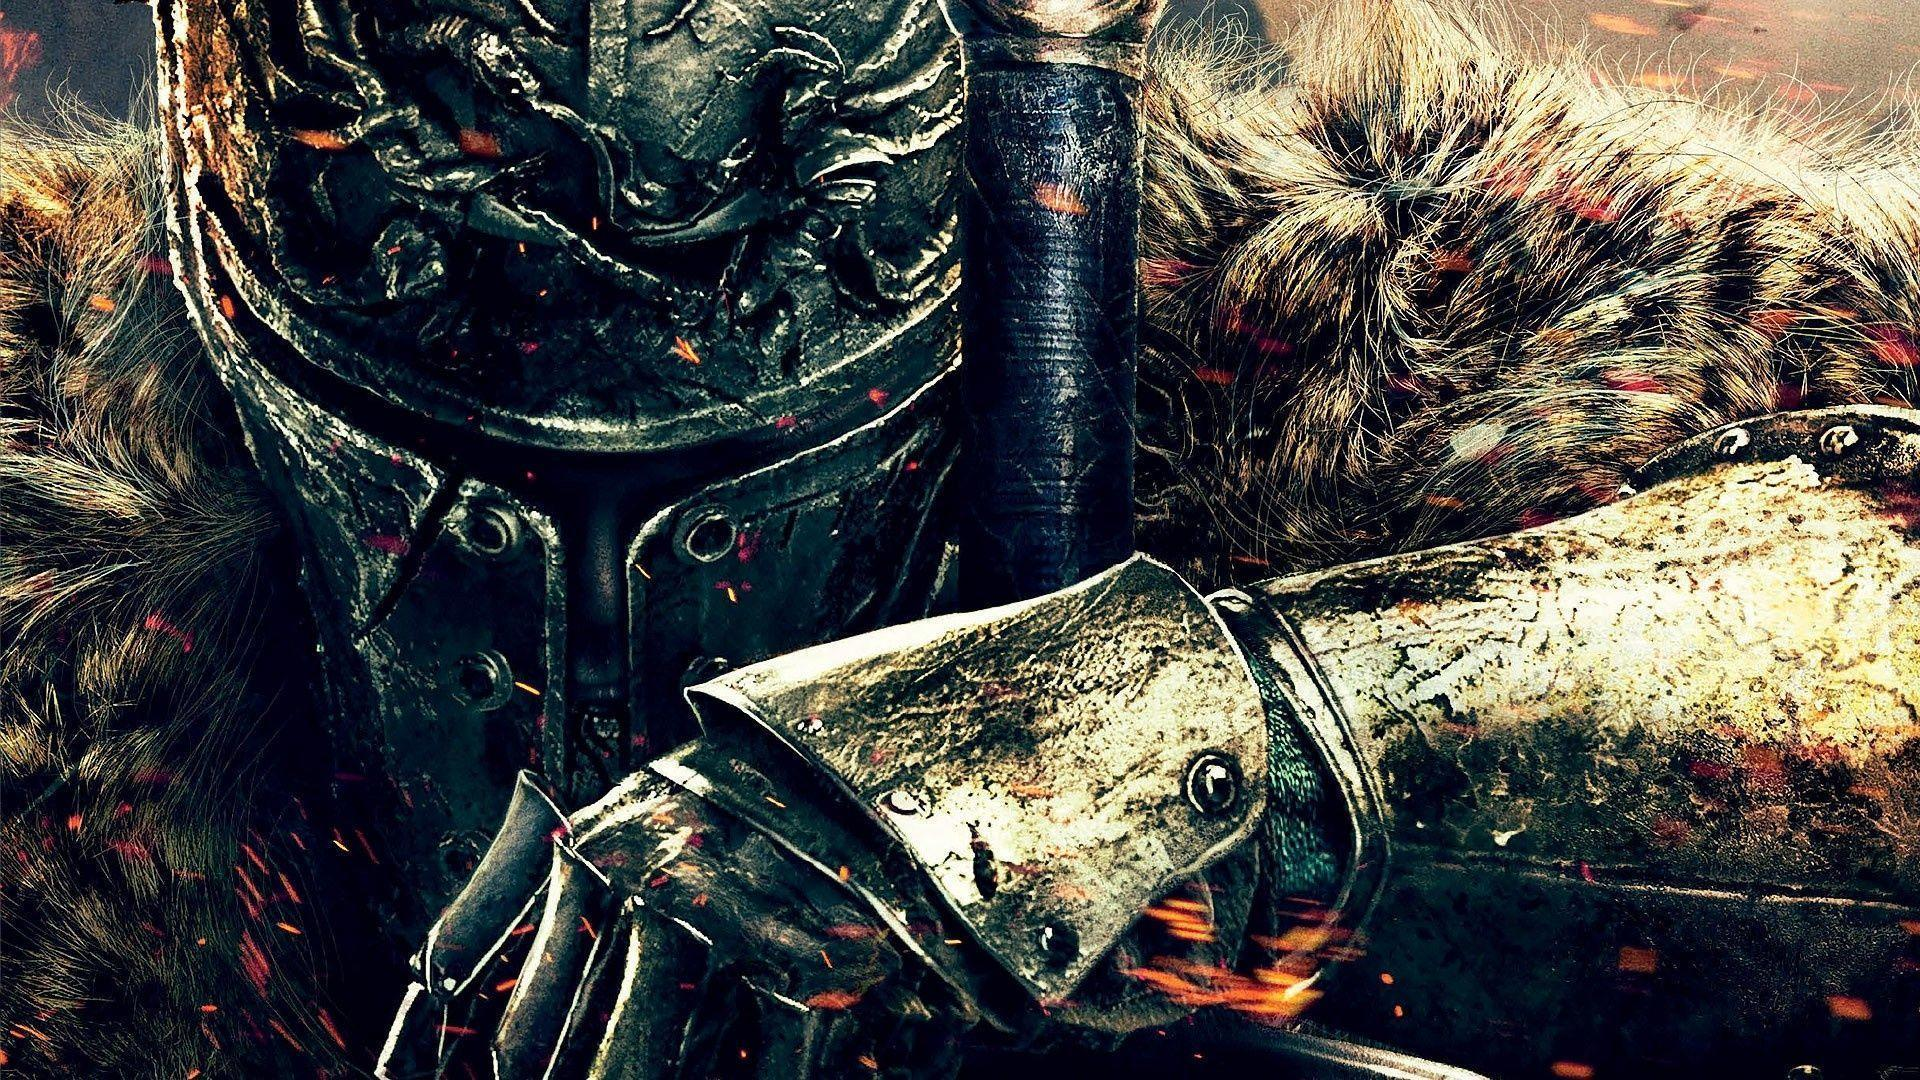 Dark Souls 3 Wallpaper 1080p: Dark Souls II Wallpapers